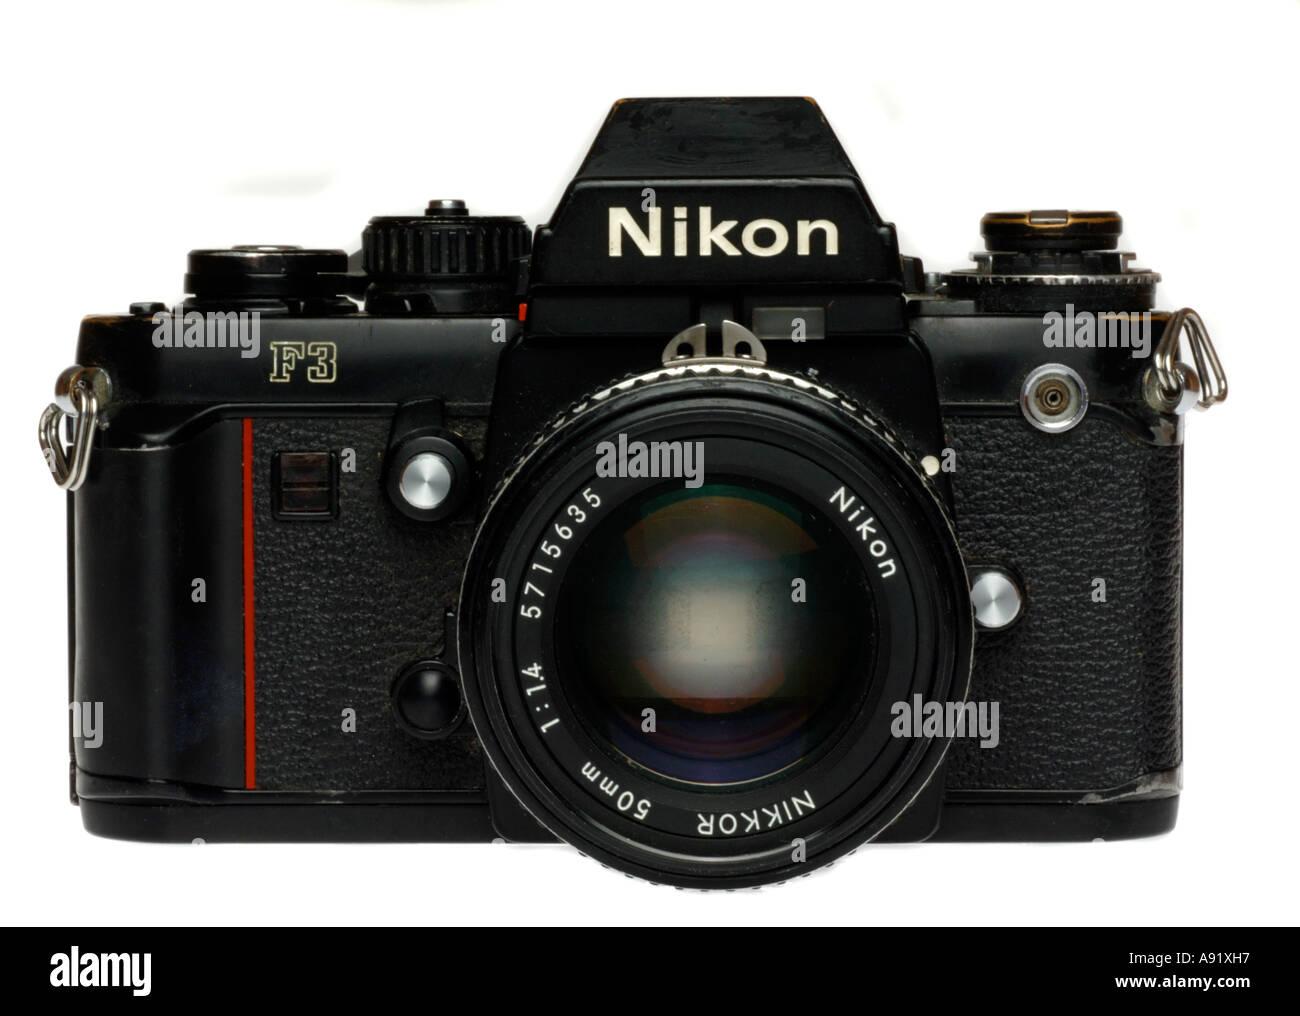 Nikon F3 camera - Stock Image